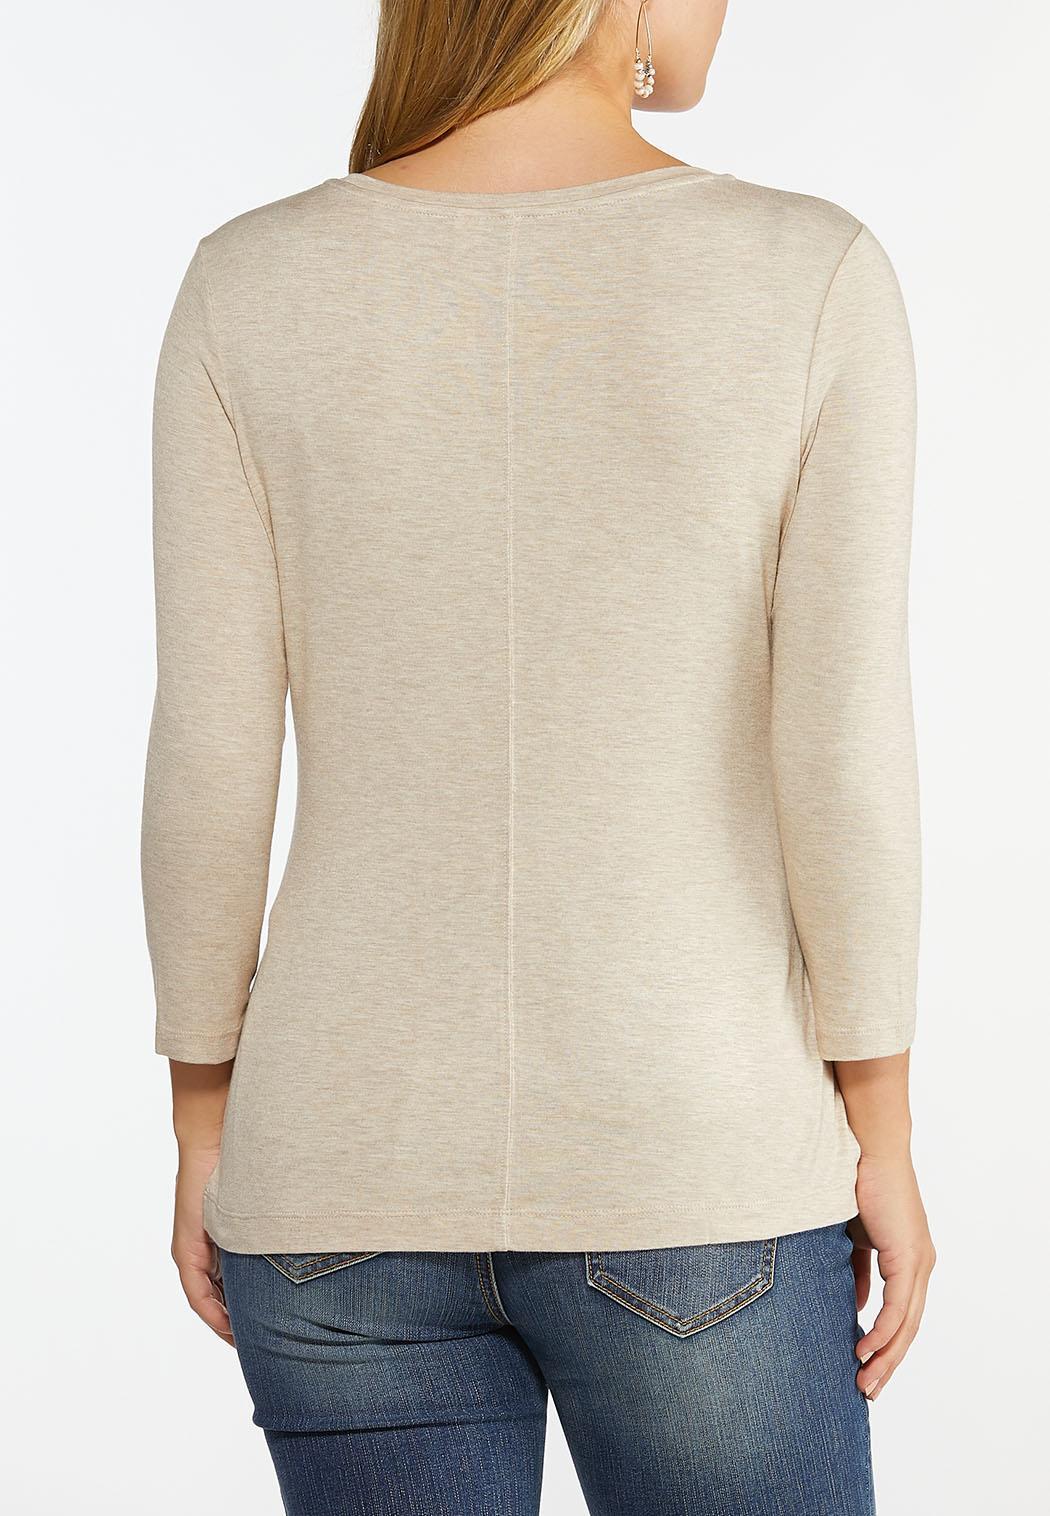 Solid Long Sleeve Tee Shirt (Item #44440843)